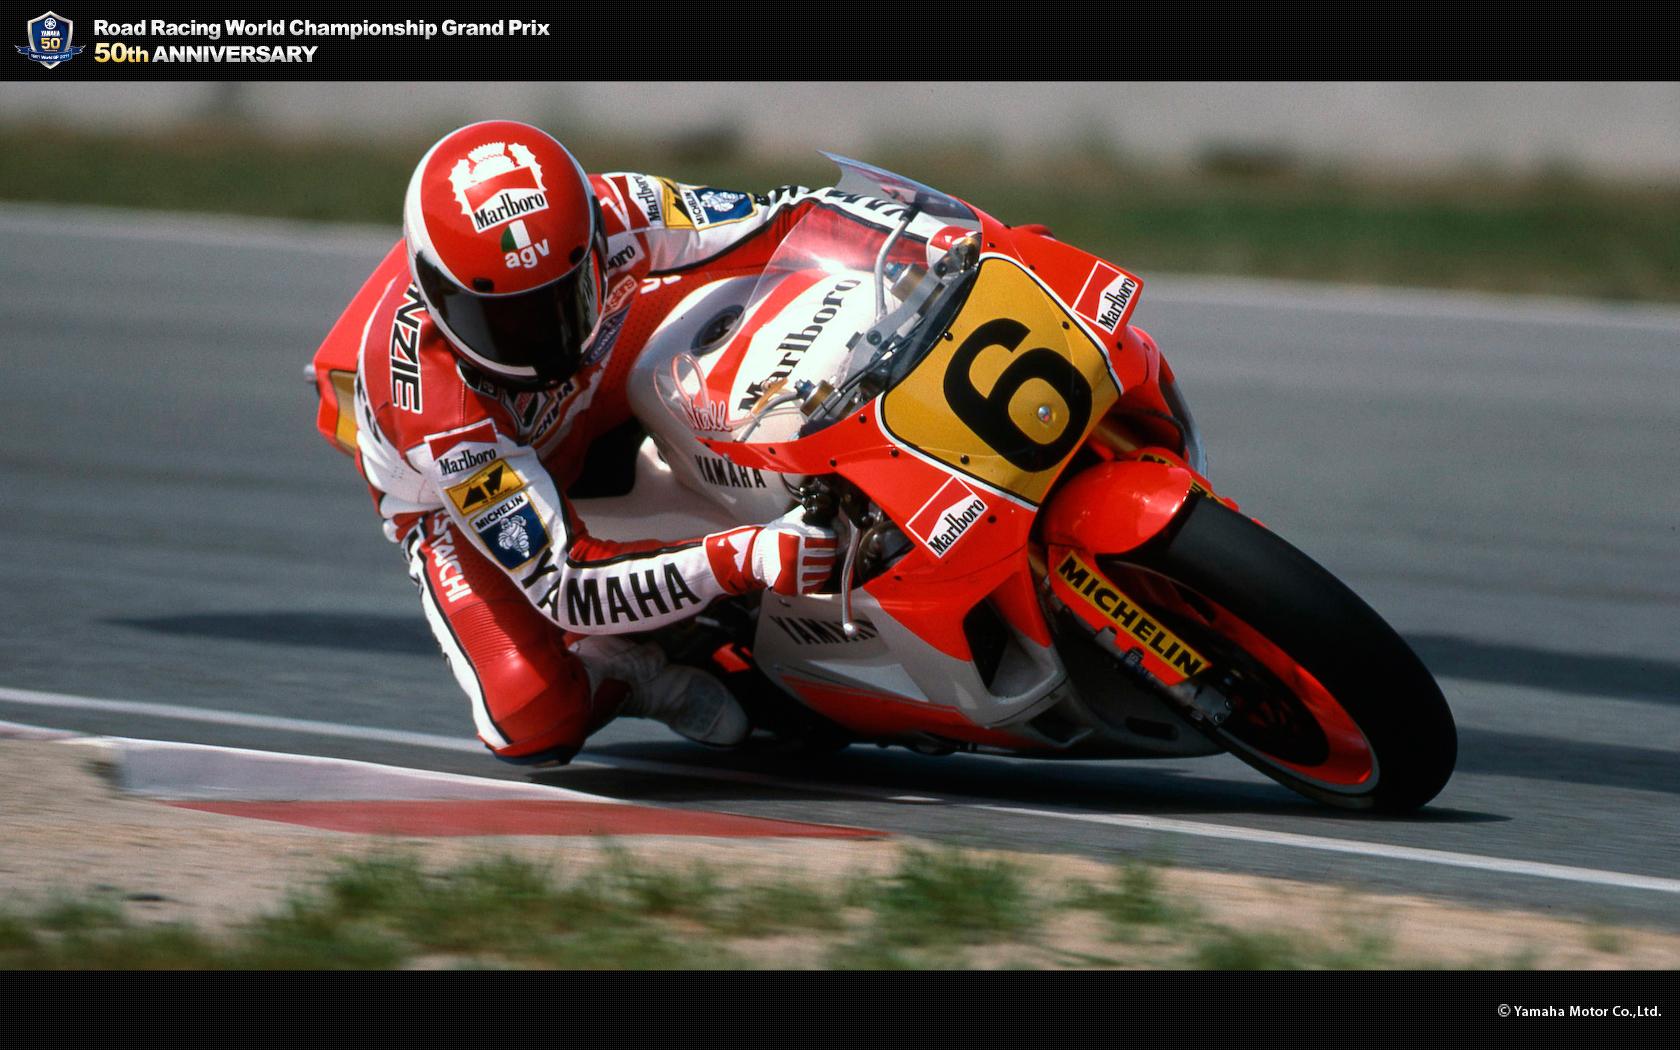 Niall Mackenzie - race | Yamaha Motor Co., Ltd.